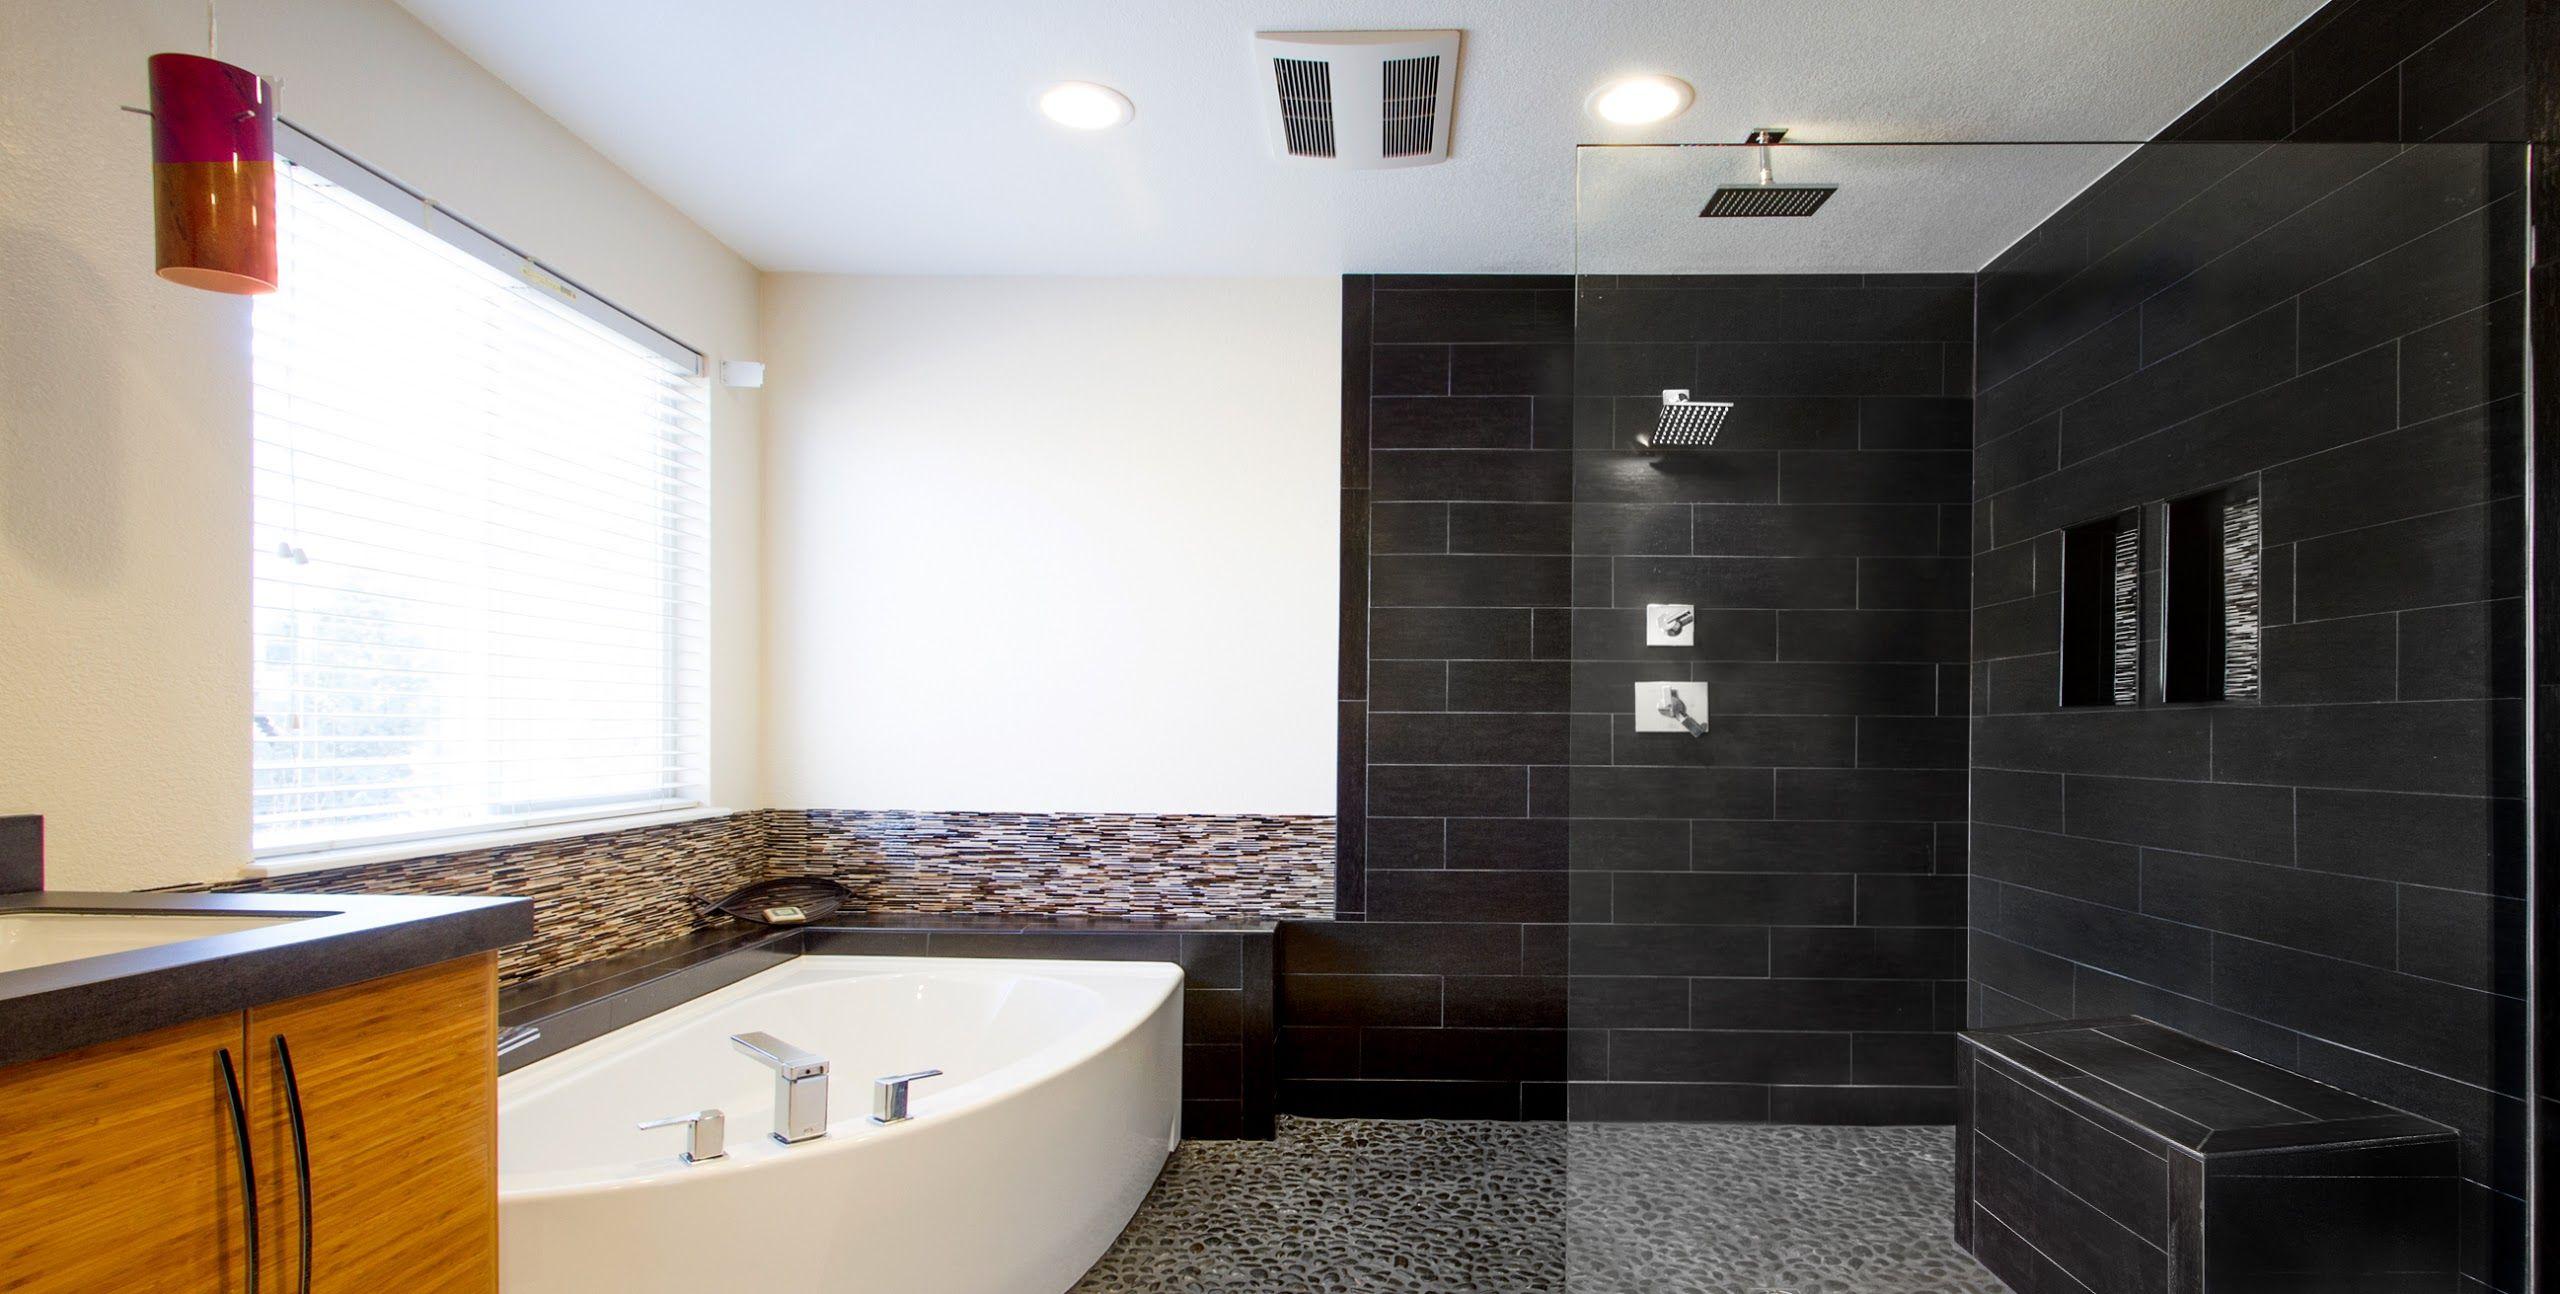 Garden Tub and Walk-in Shower - True Form Building | Spa Bathrooms ...